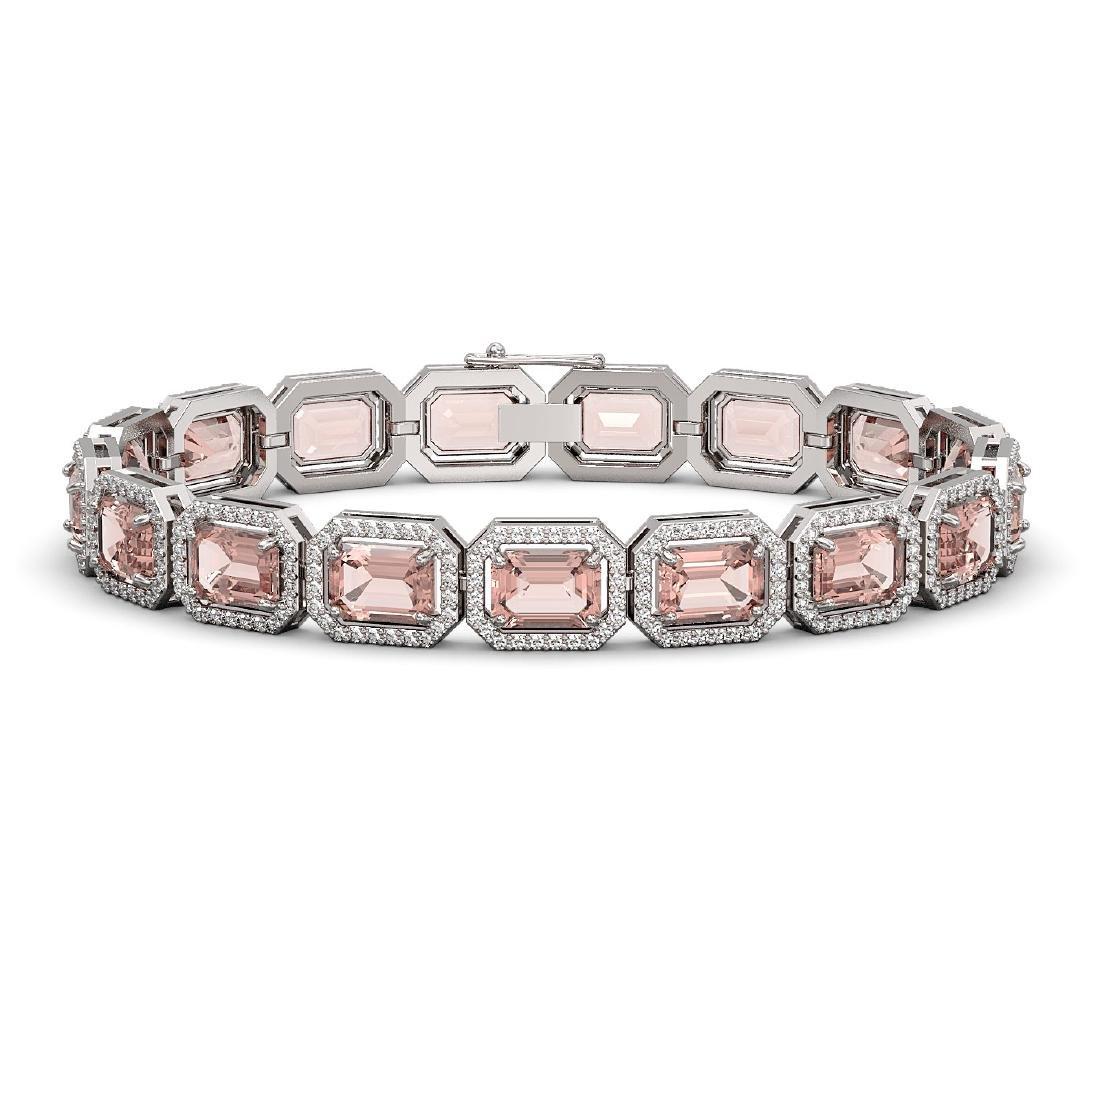 22.81 CTW Morganite & Diamond Halo Bracelet 10K White